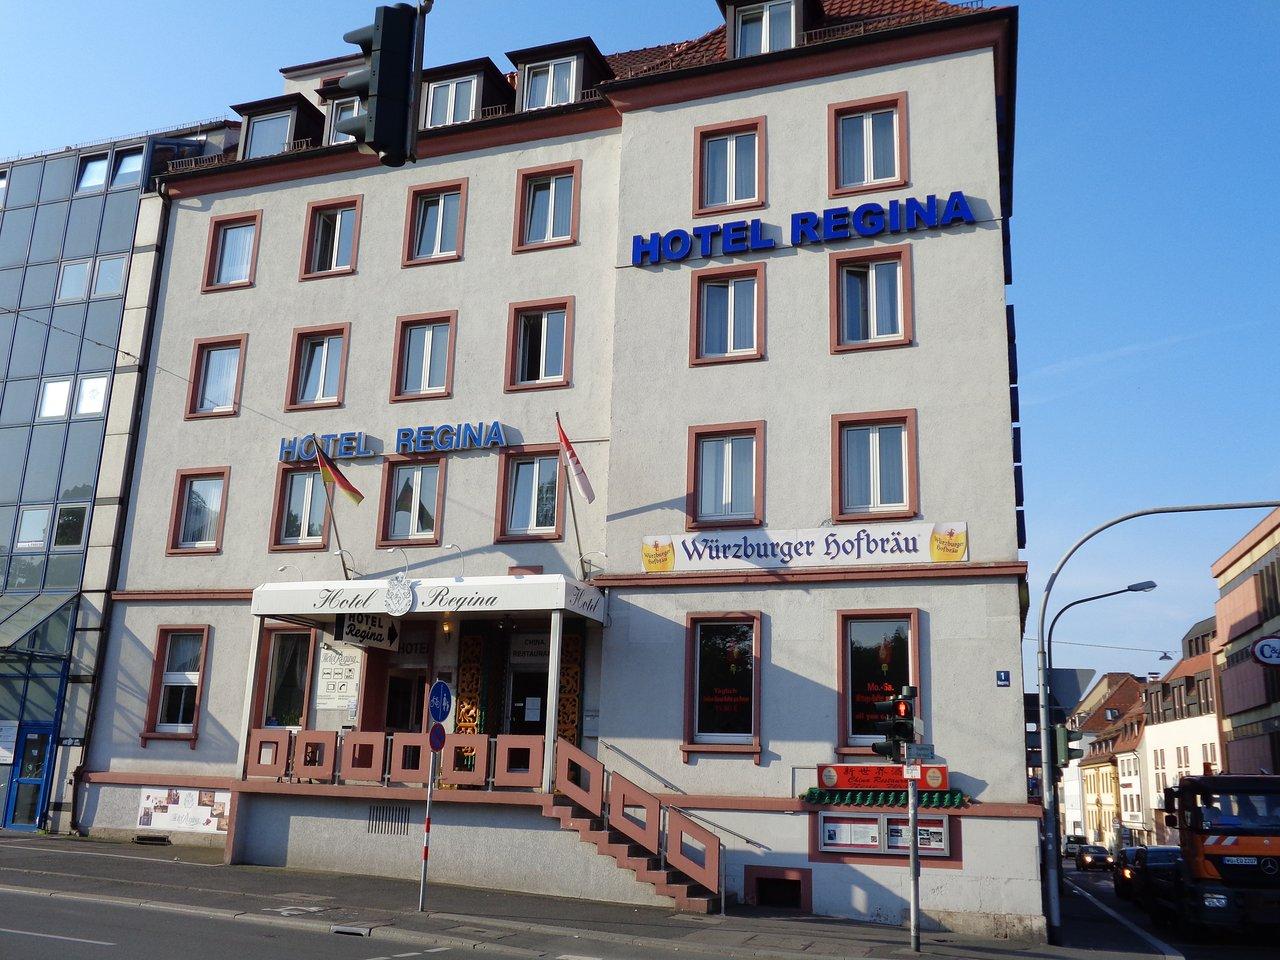 Hotel Regina Wurzburg Hotel Regina Wurzburg Saksamaa